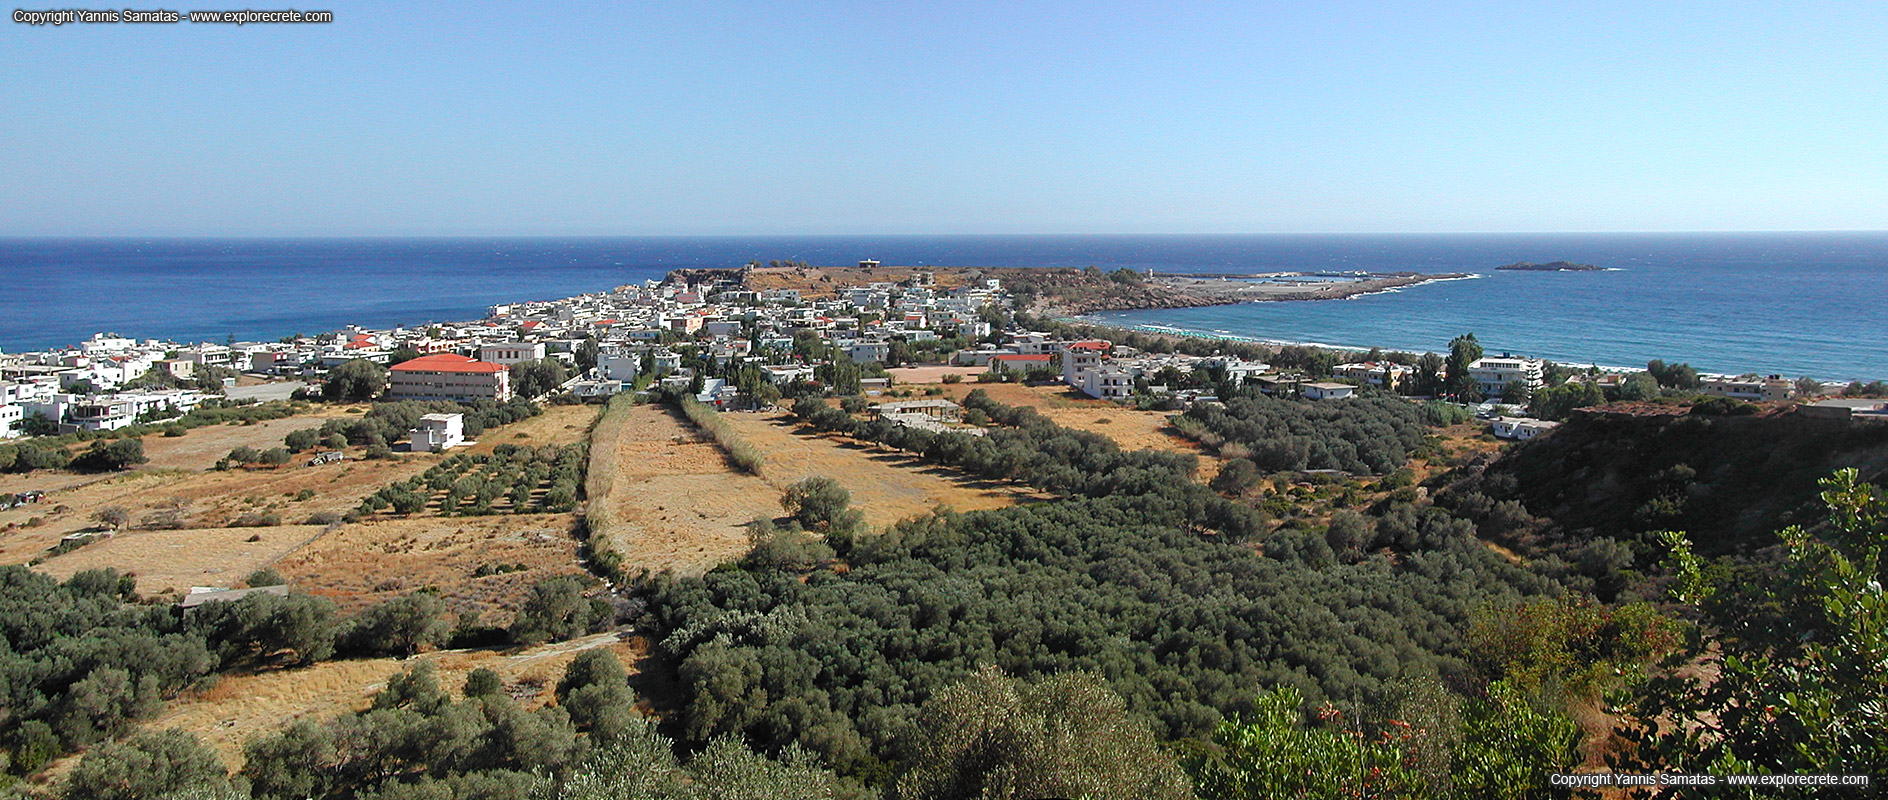 Paleochora Crete, information about Paleochora